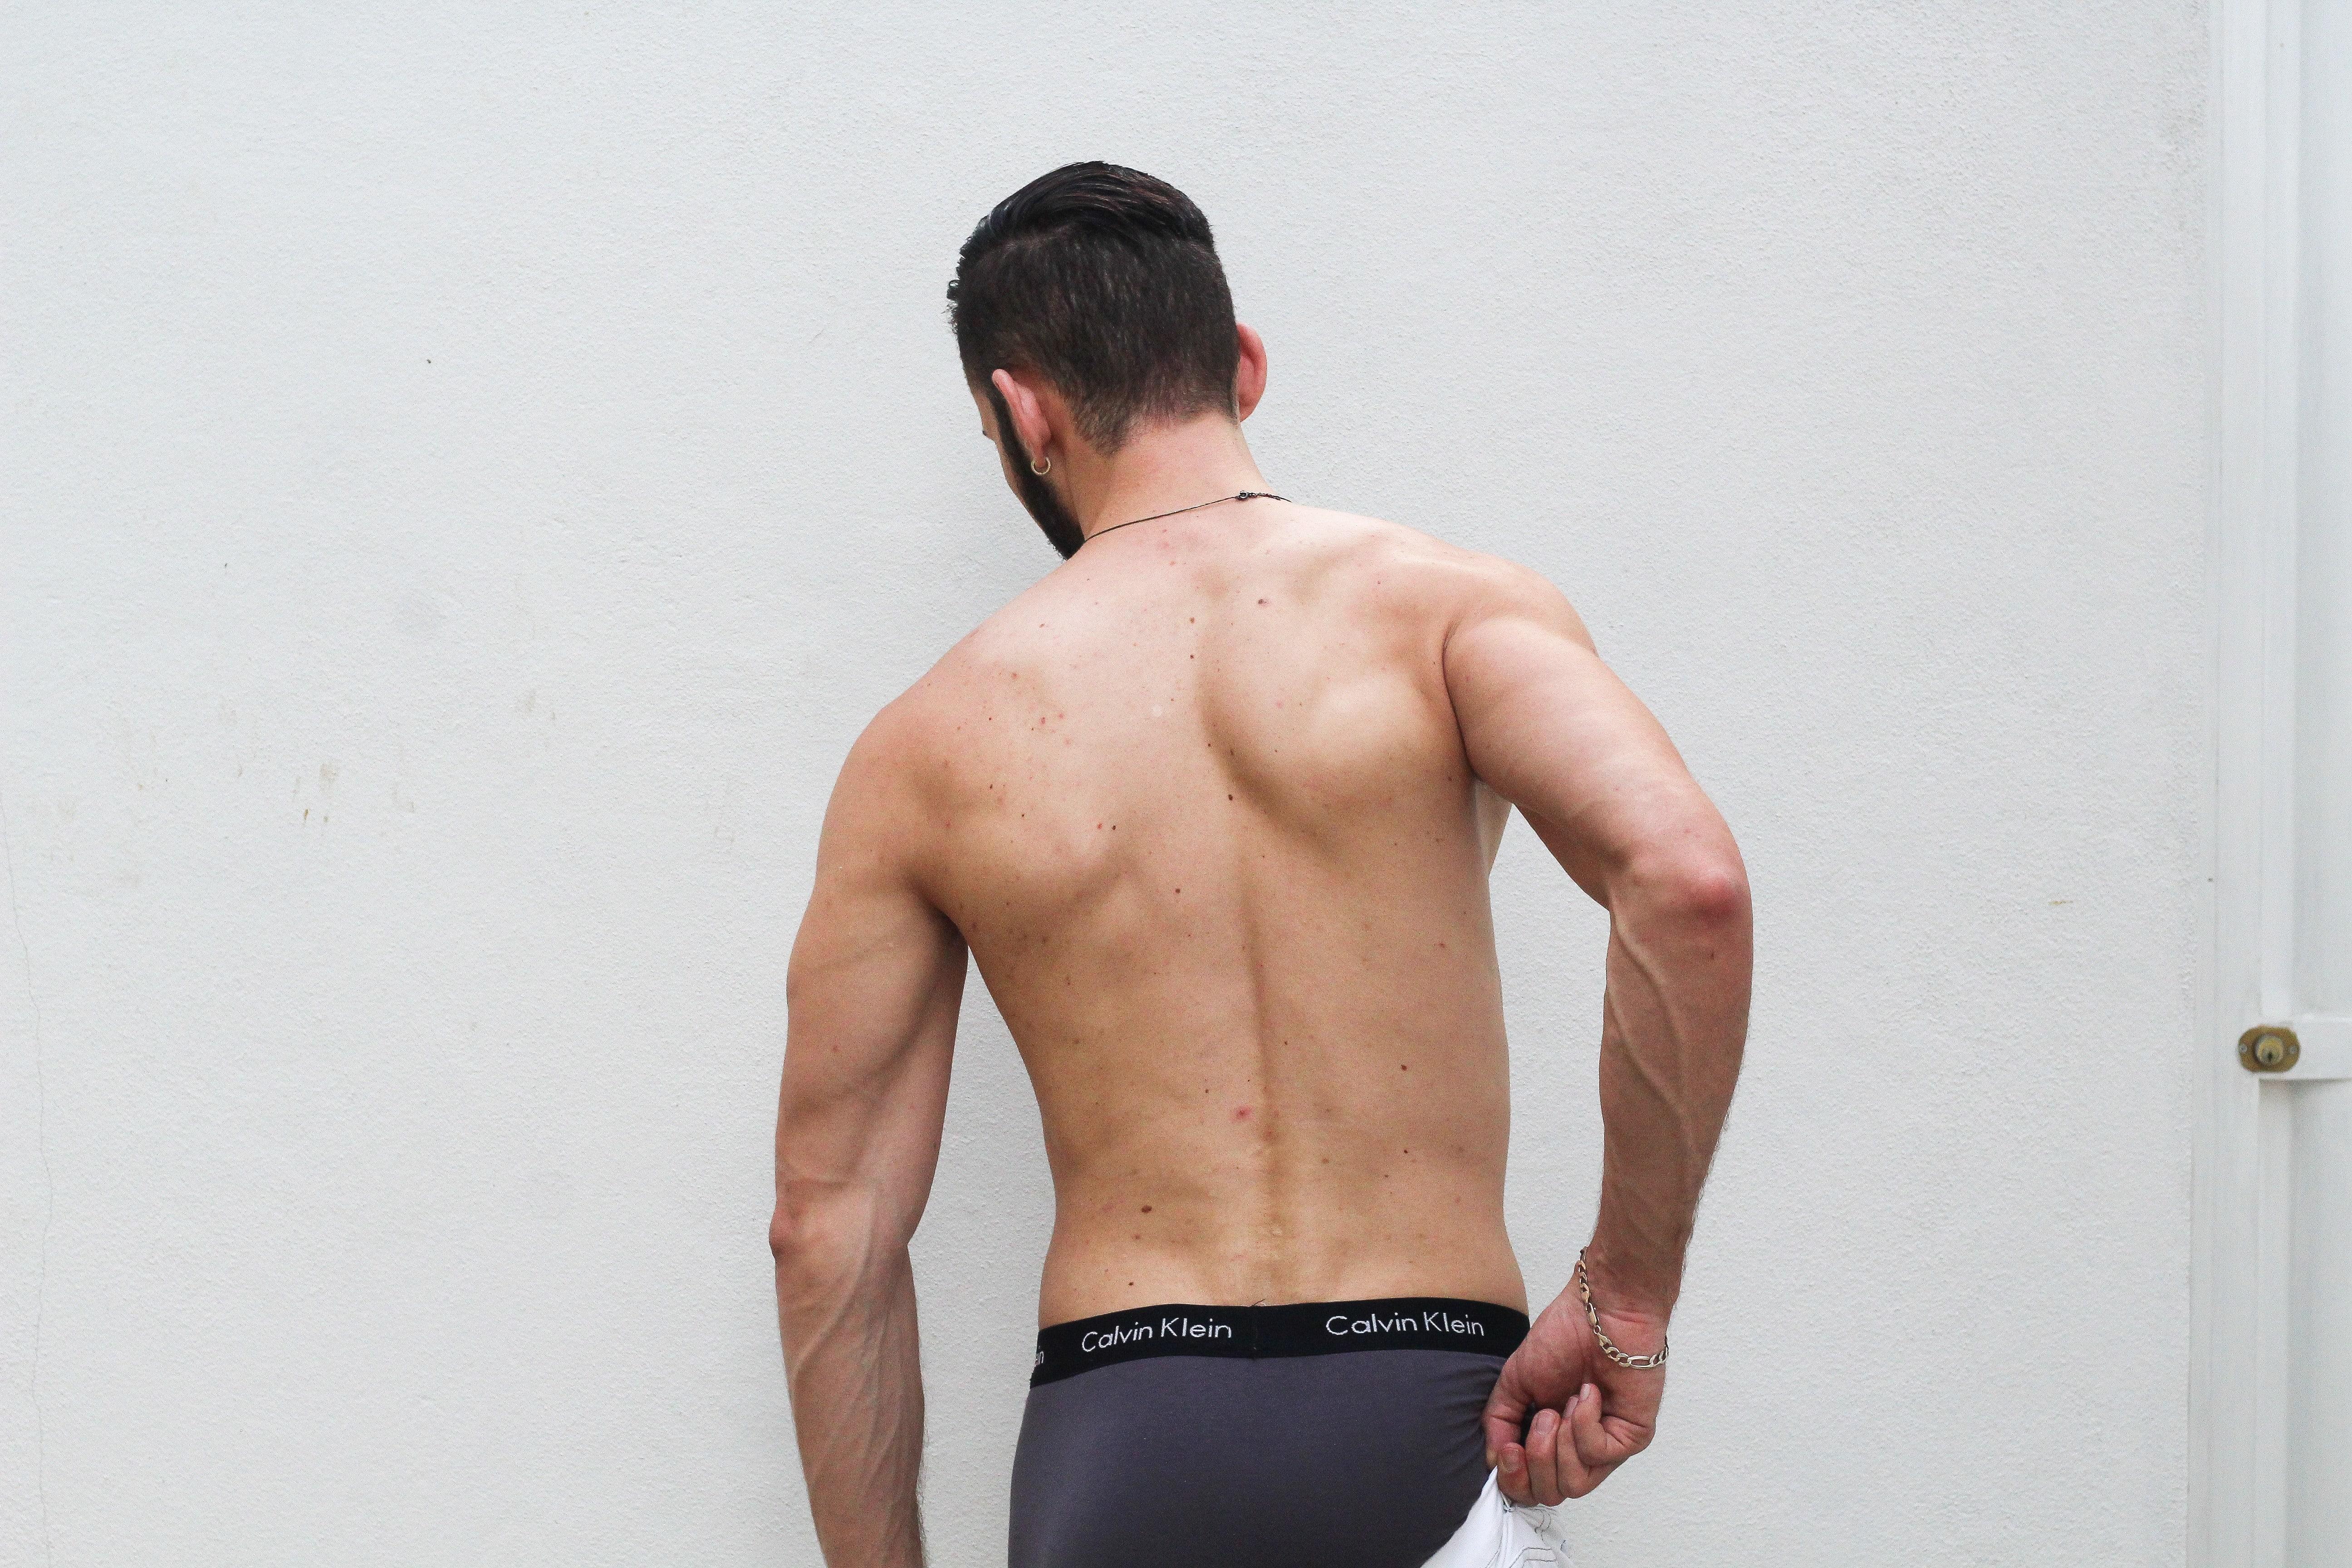 Ask The Batemaster: How Often Should I Ejaculate?